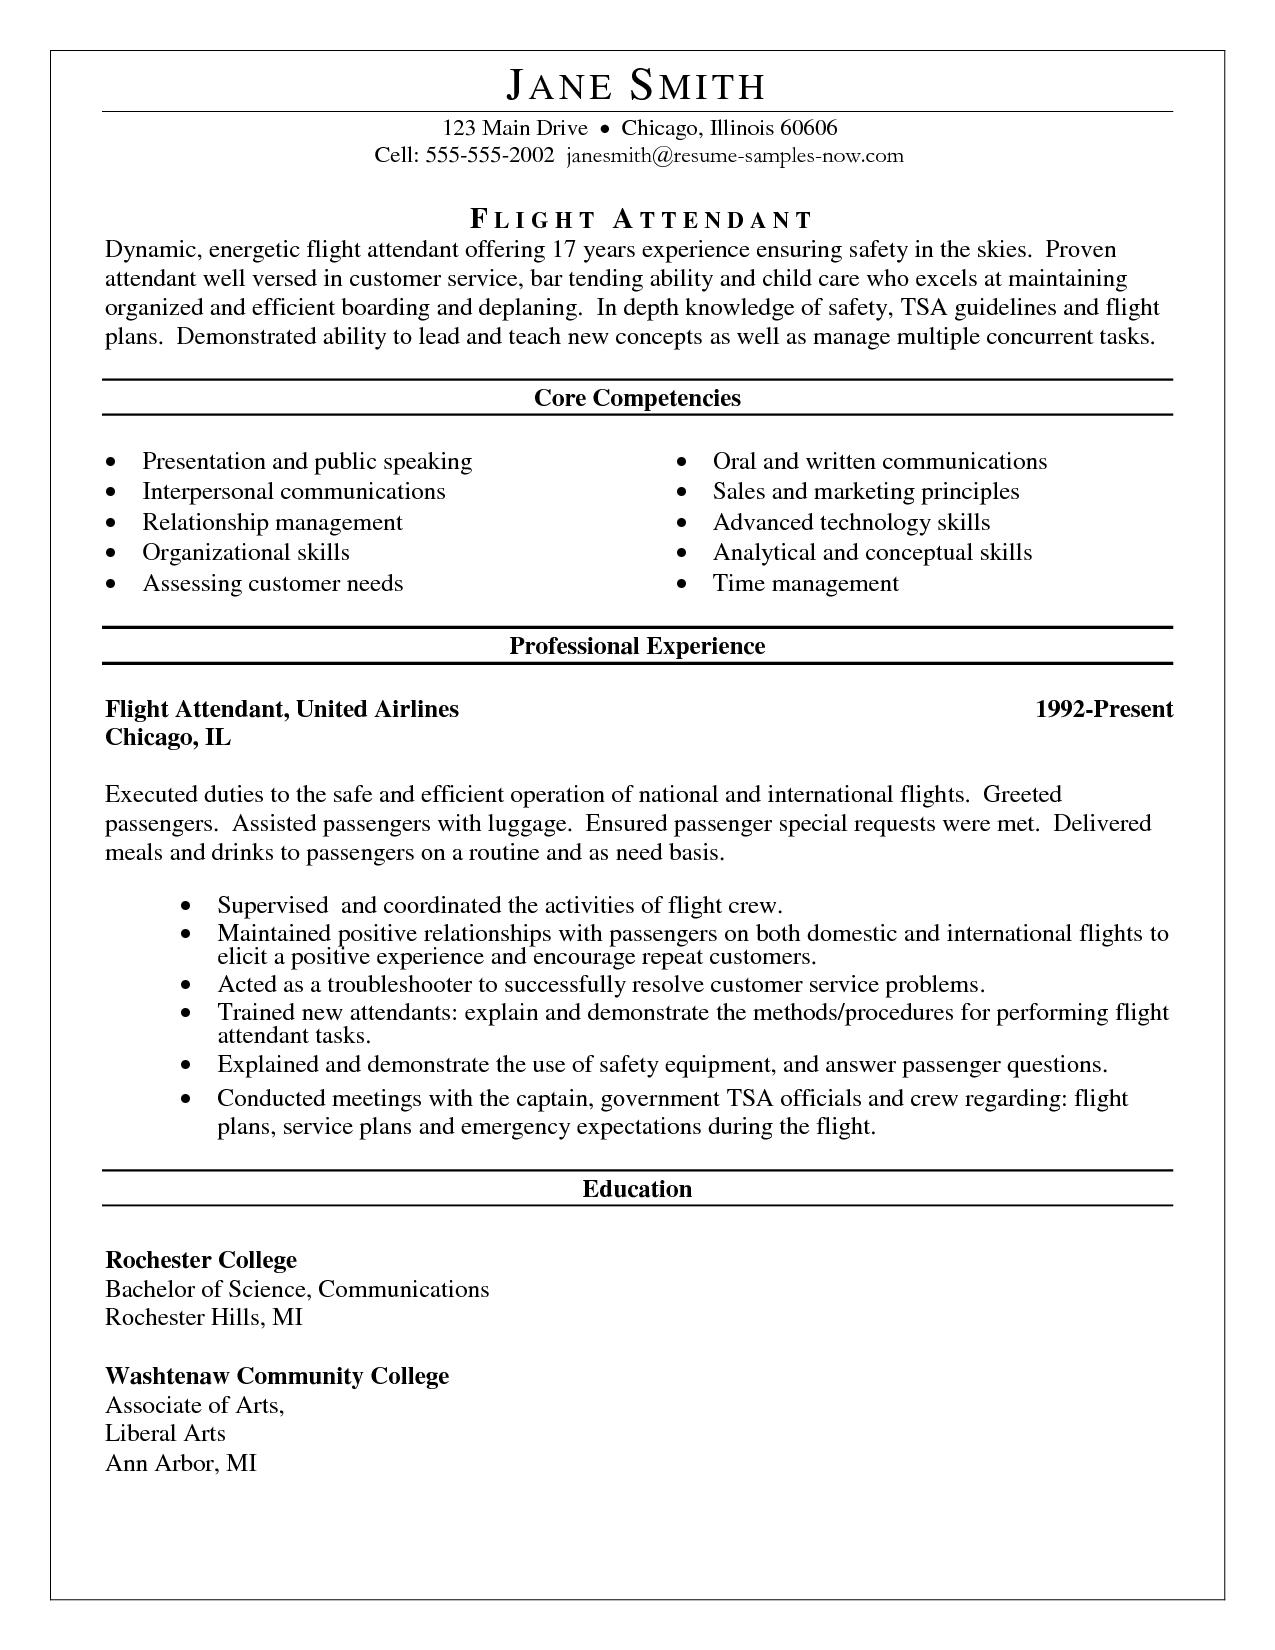 resume template competencies